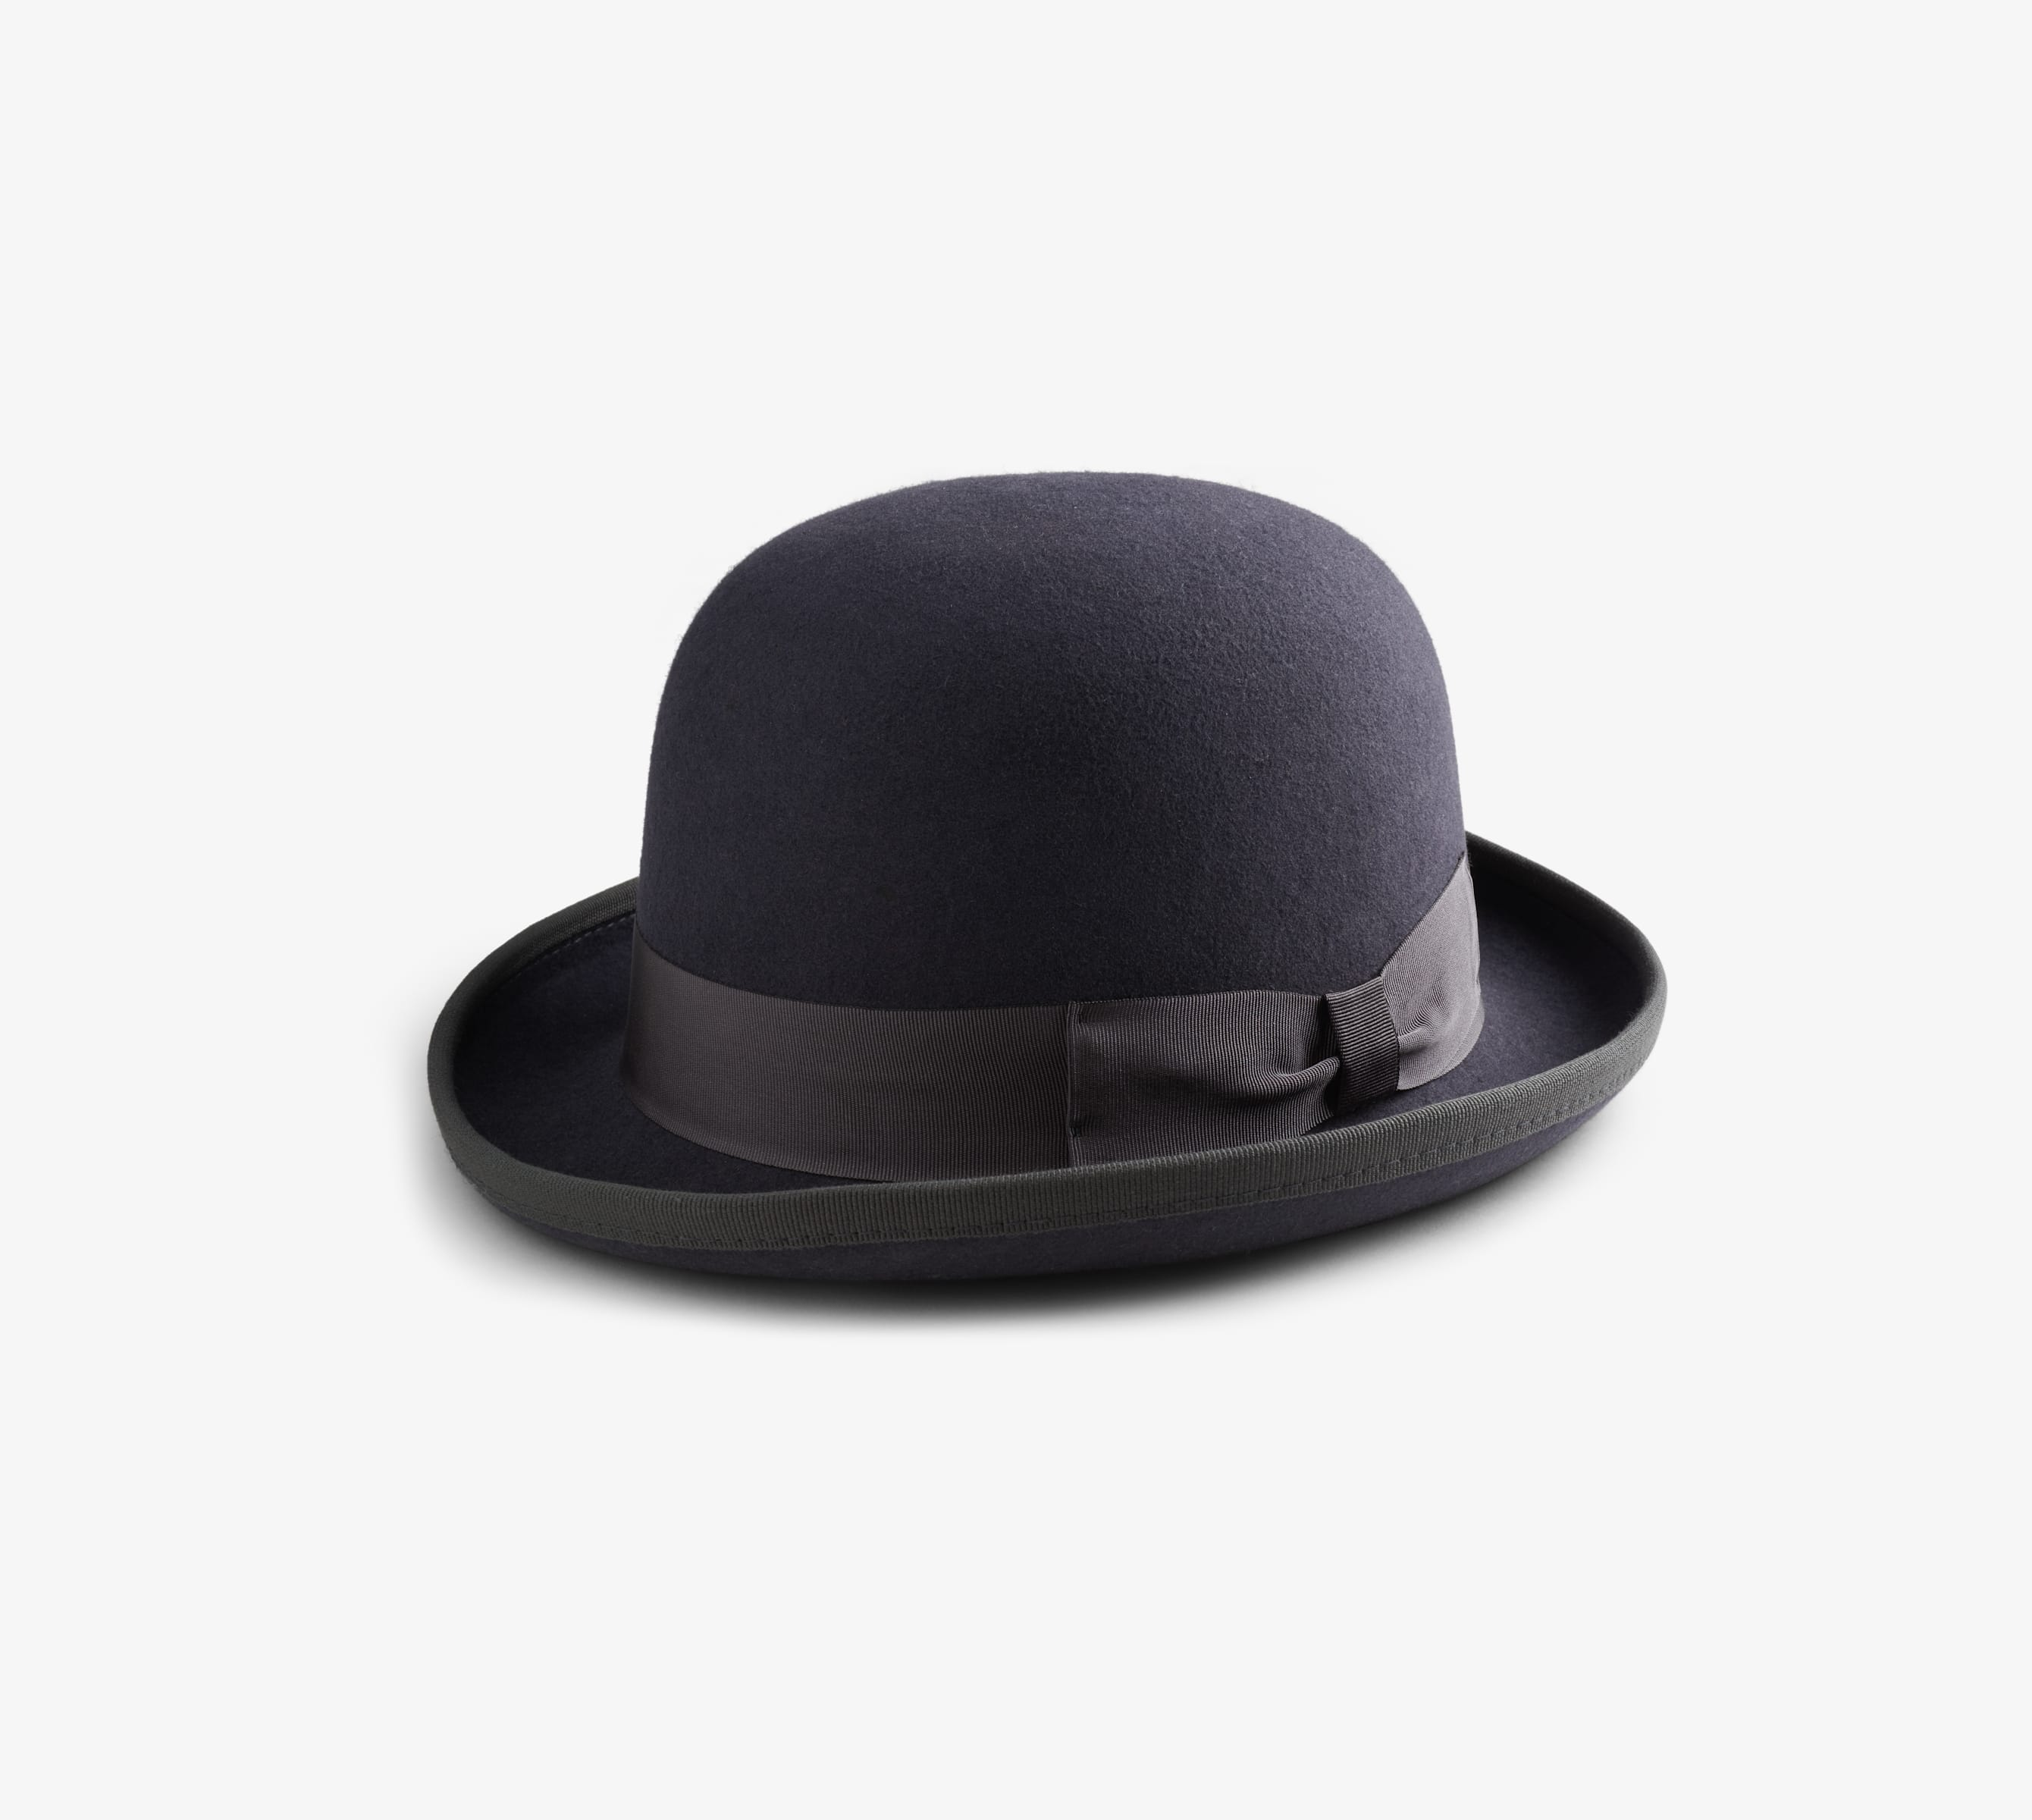 Grey_Jort_Bowler_Hat_HAT015